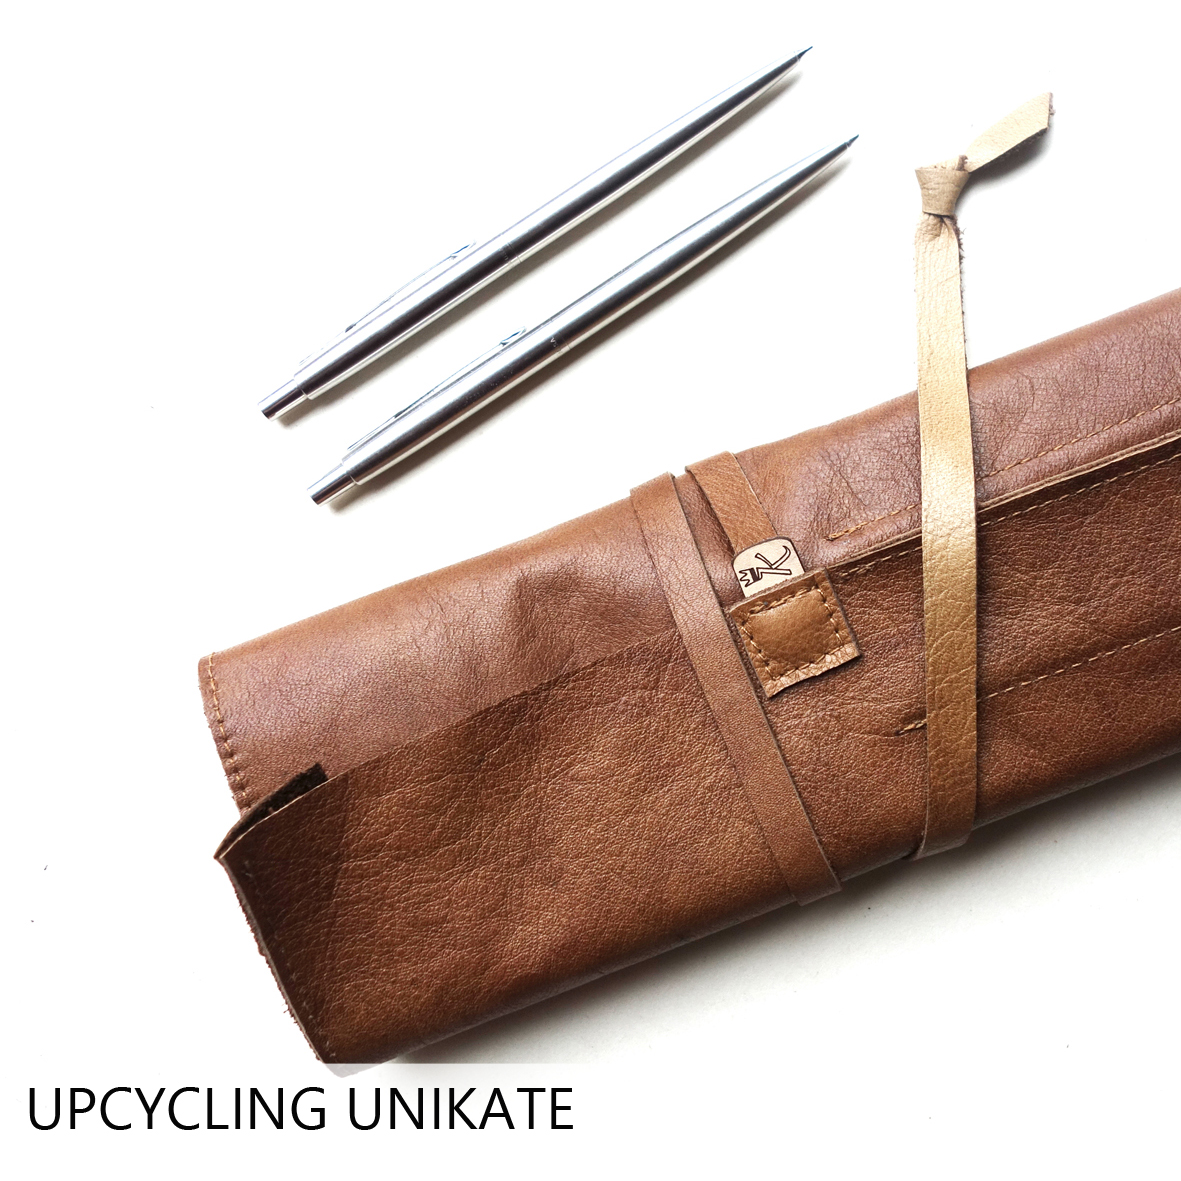 Upcycling Unikate